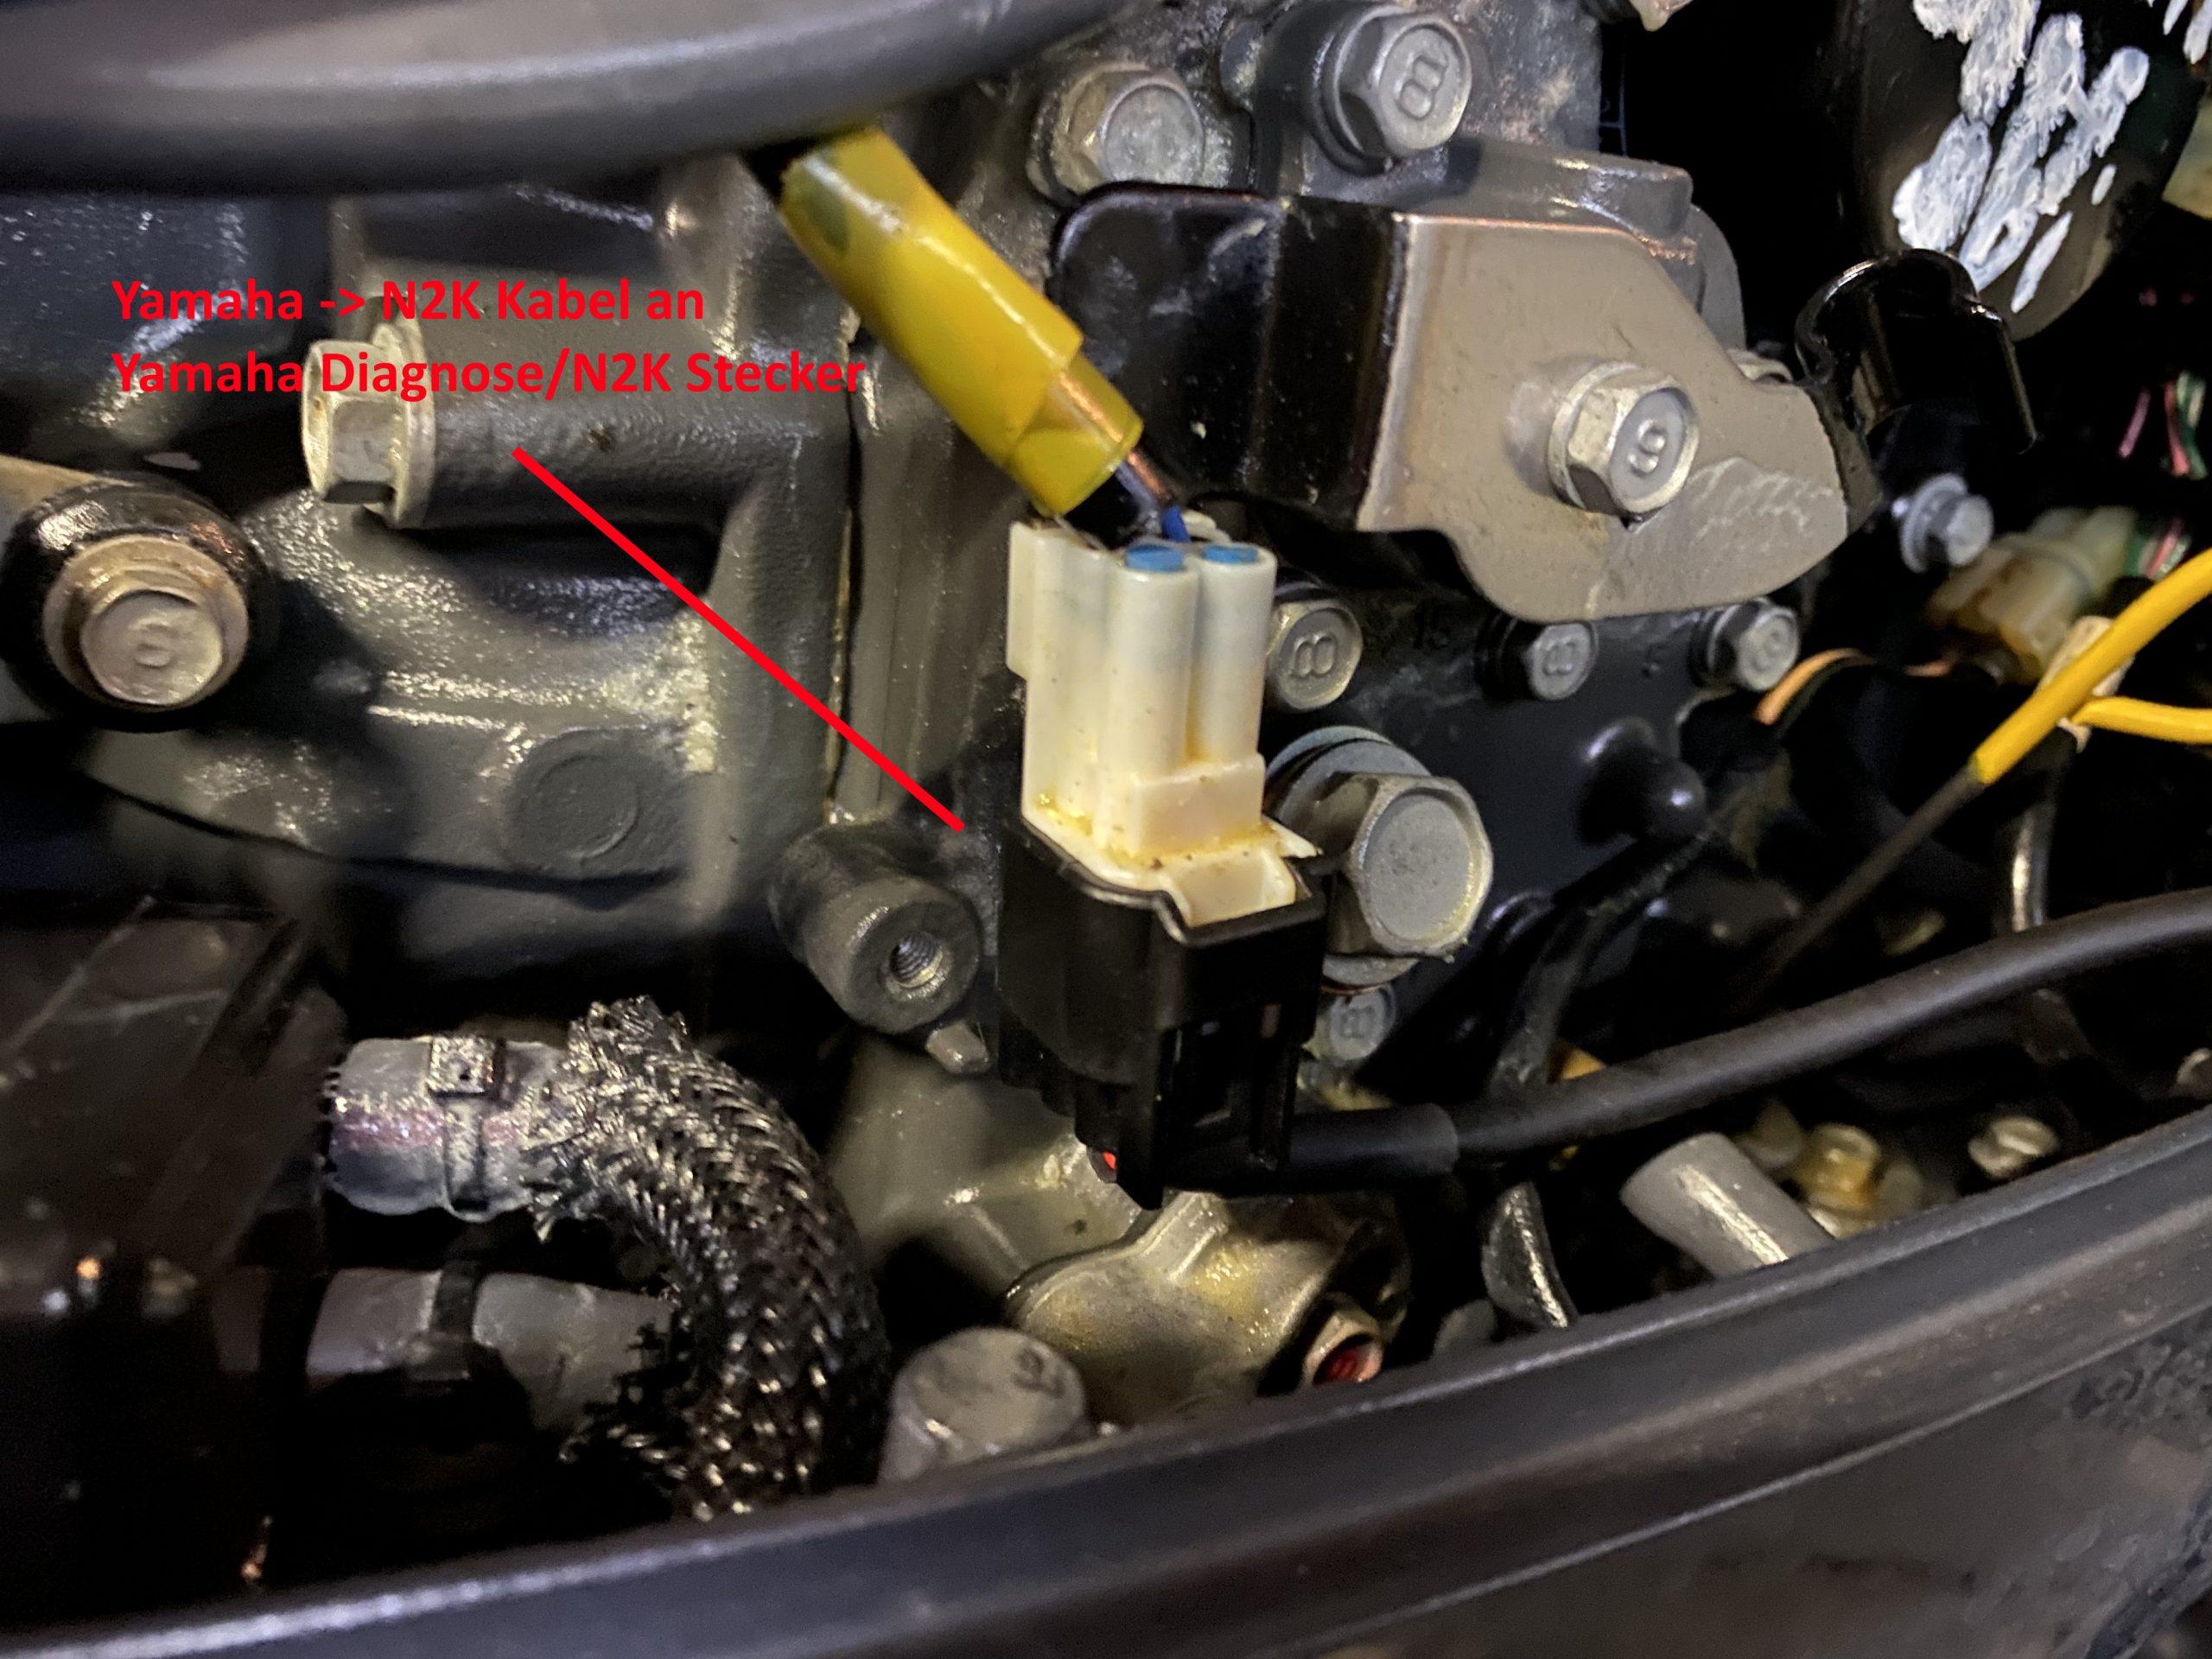 Yamaha -> NMEA2000 Kabel an Yamaha NMEA 2000/Diagnose Stecker